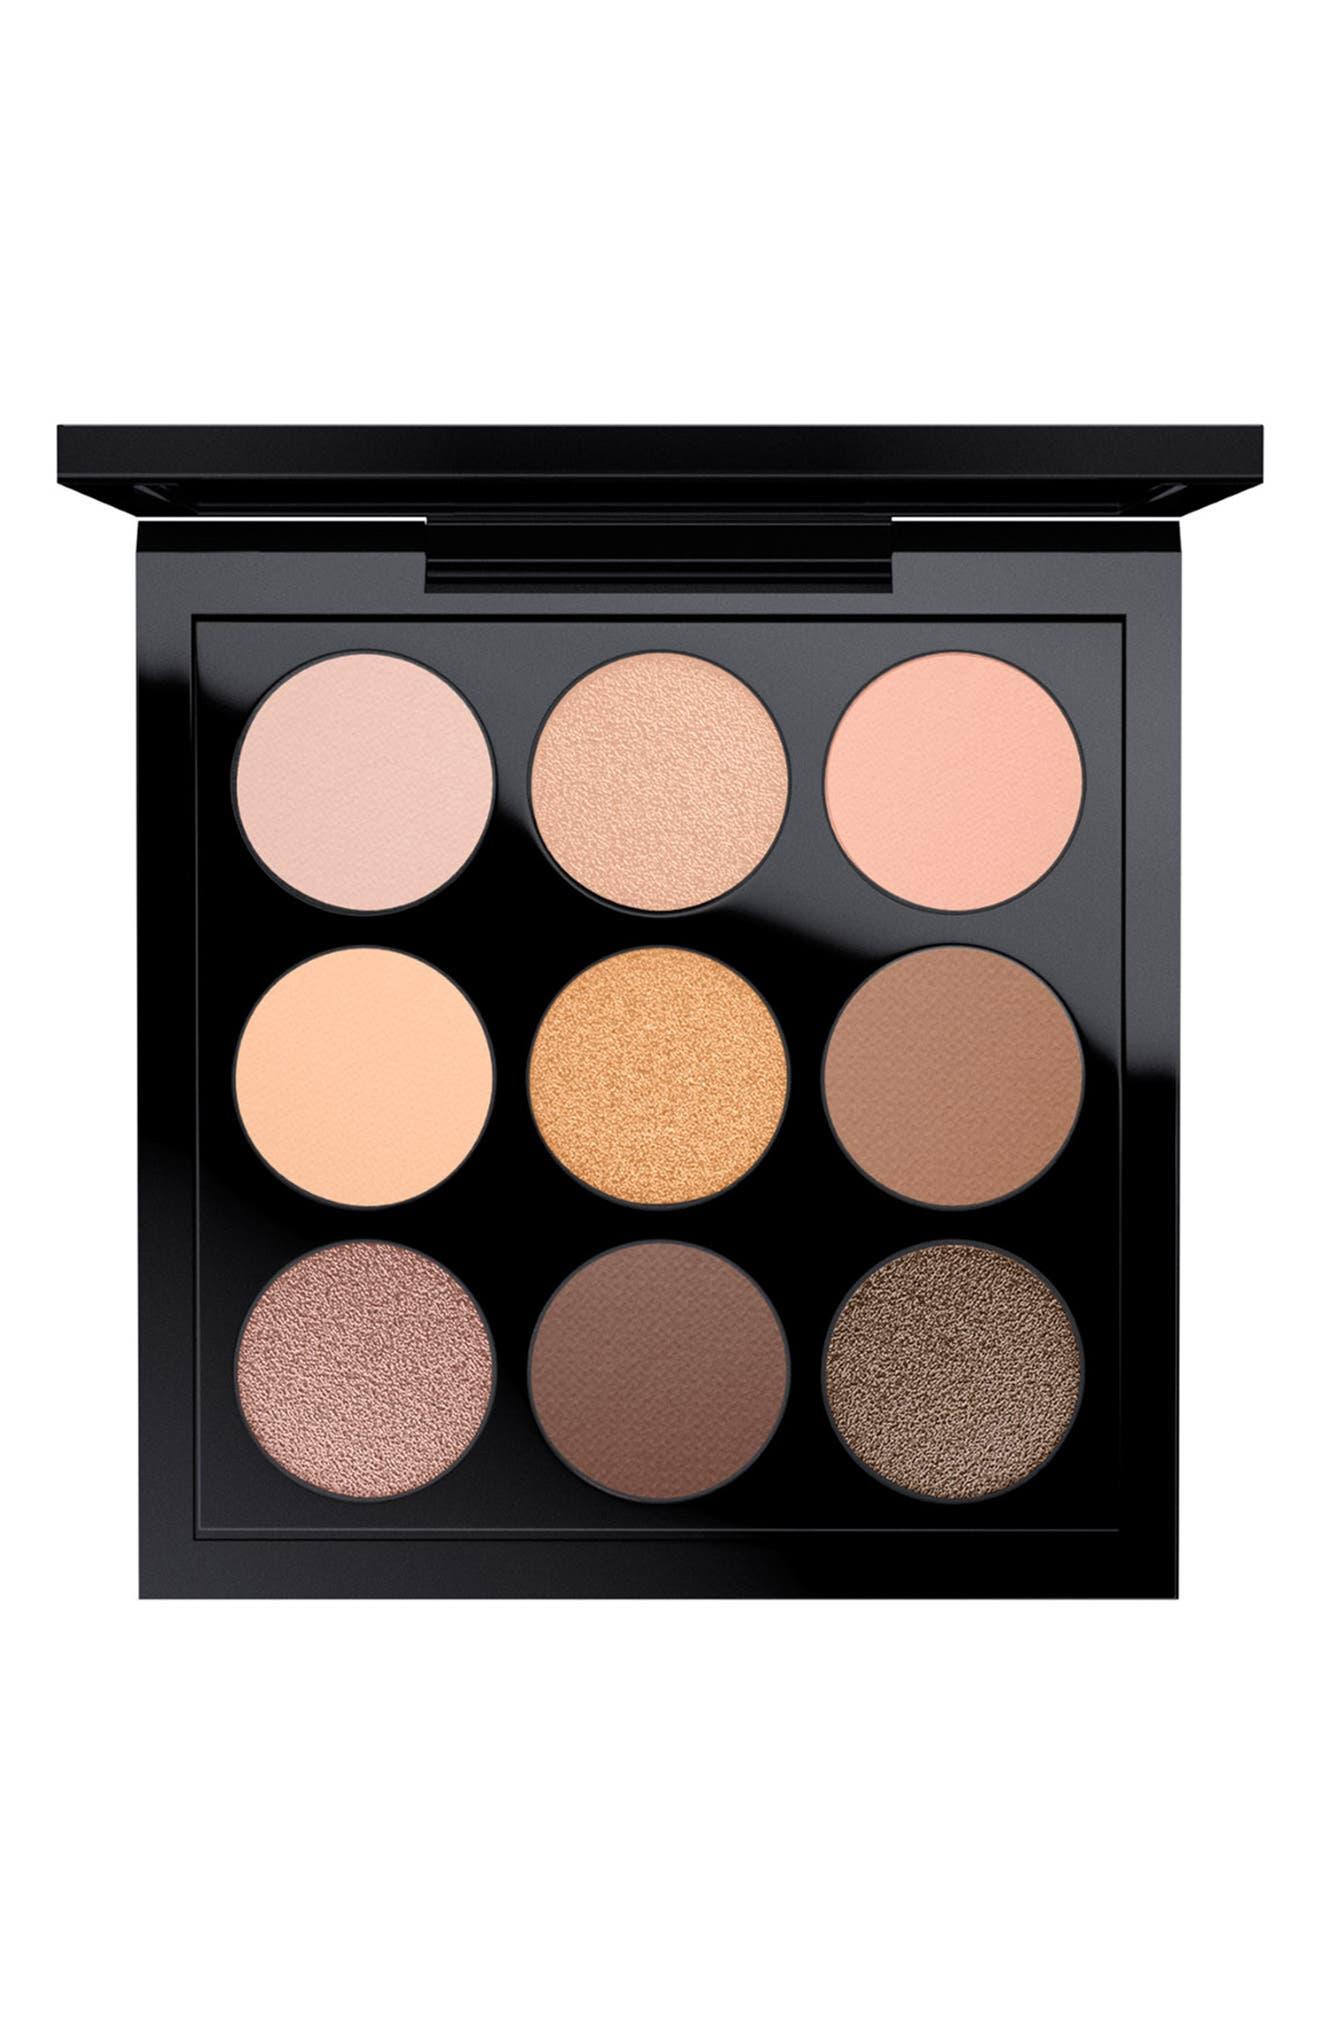 MAC Times Nine Eyeshadow Palette